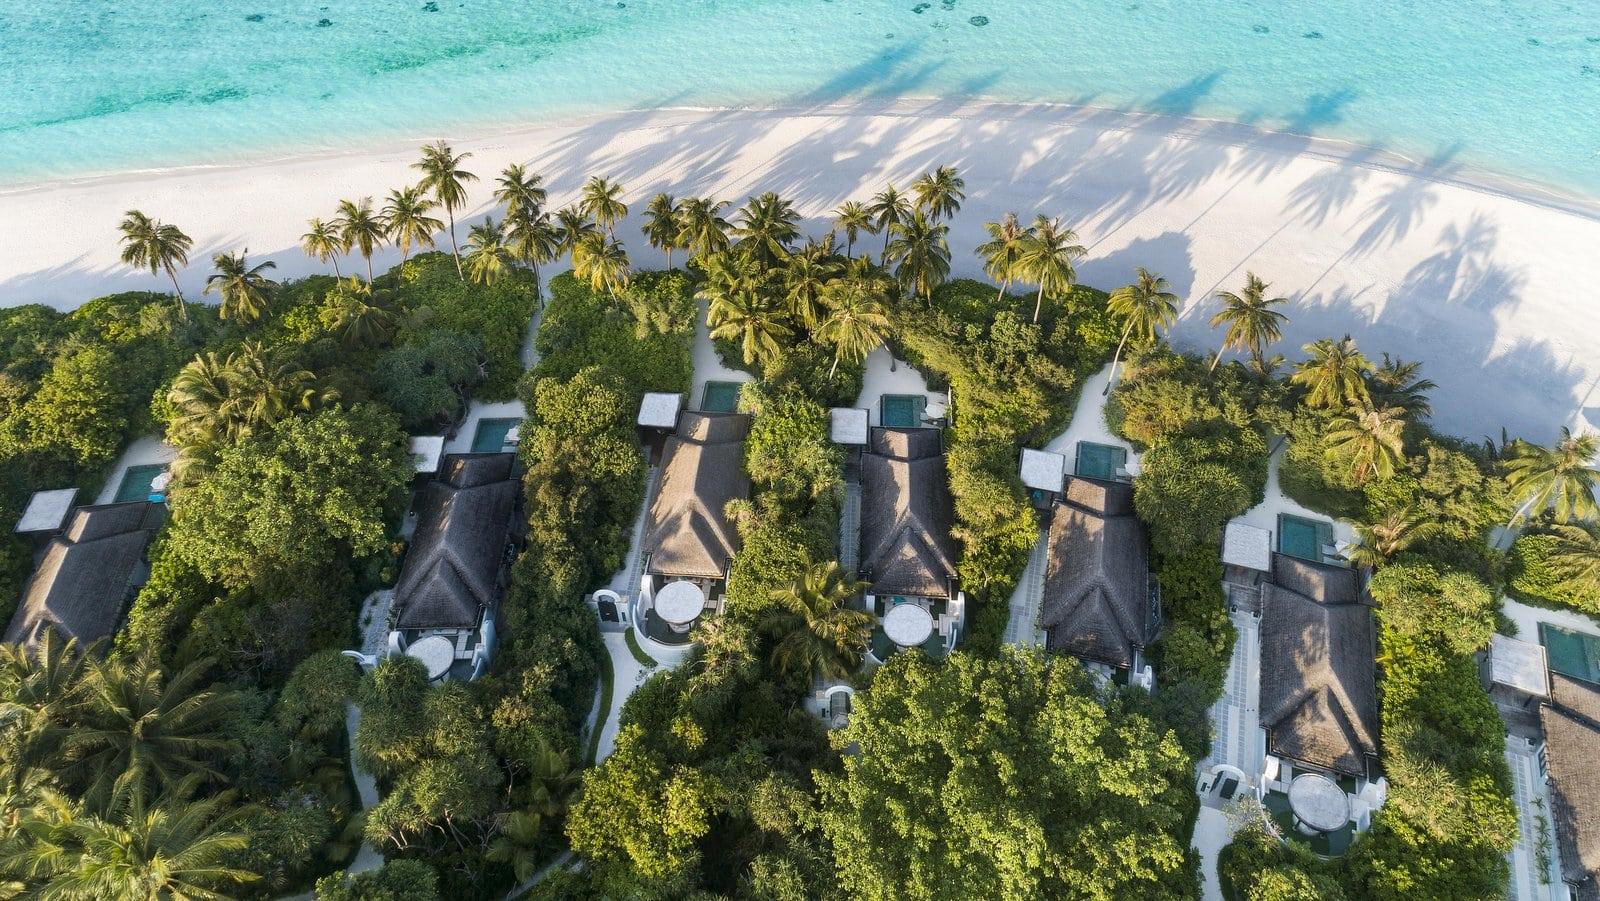 Мальдивы, отель Anantara Kihavah Maldives Villas, номер Beach Pool Villa